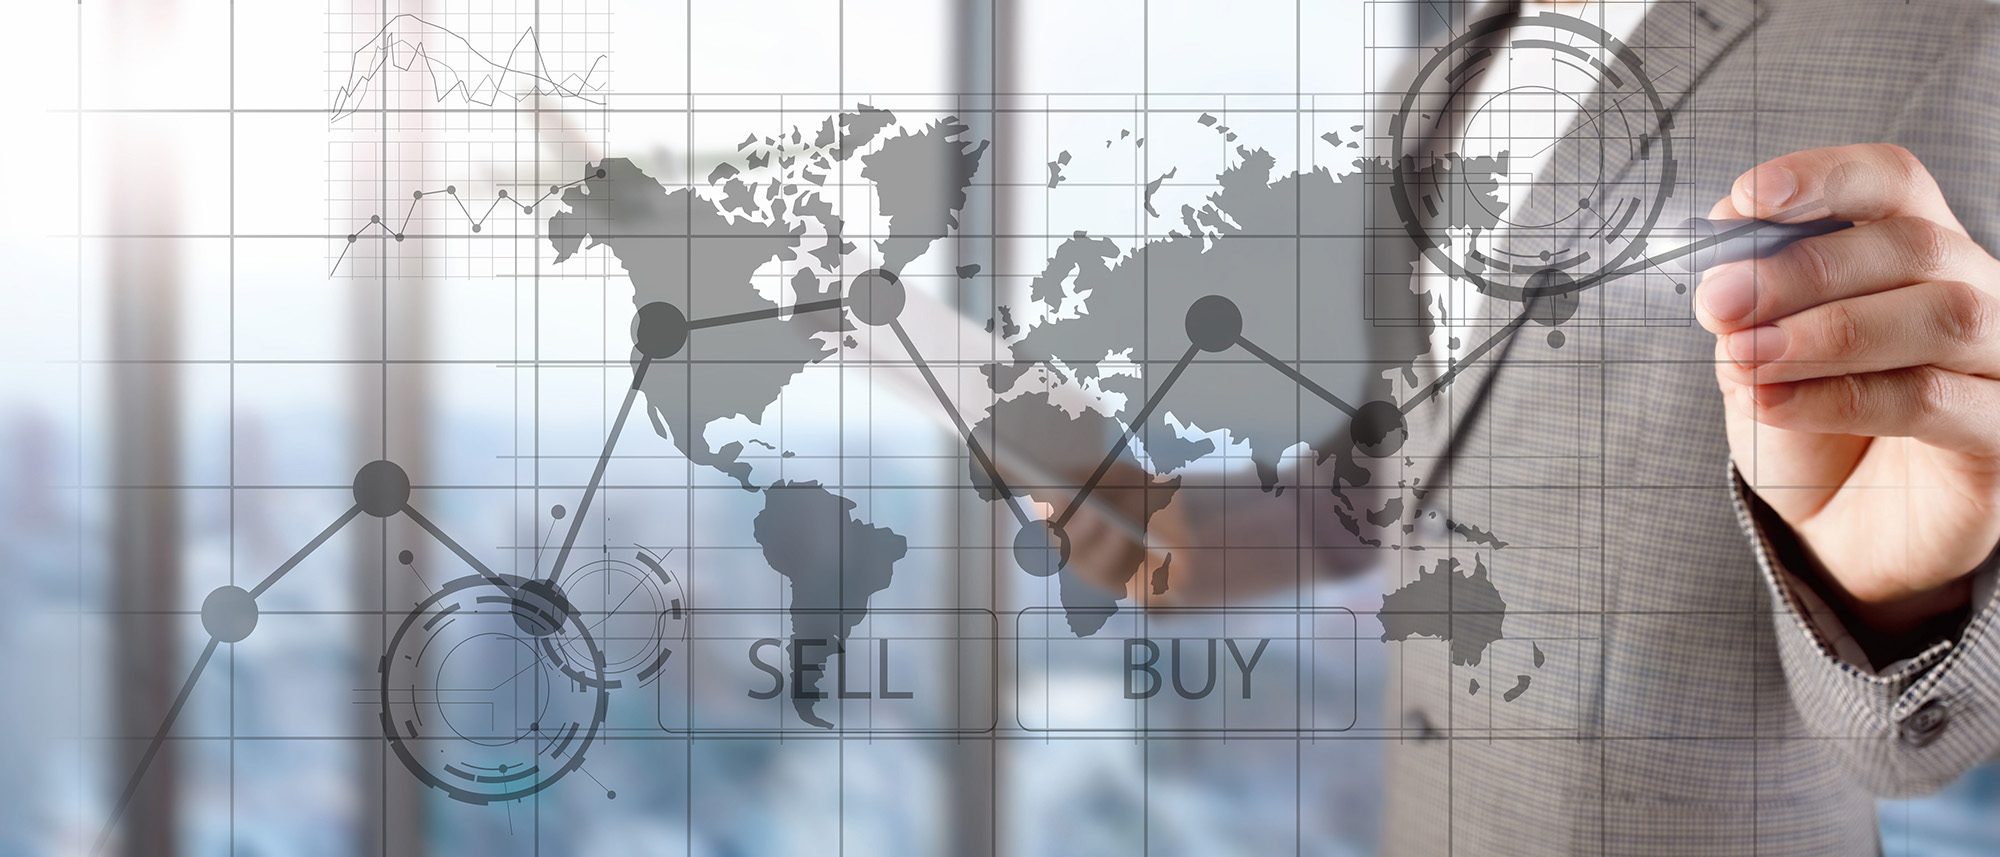 start trading forex now